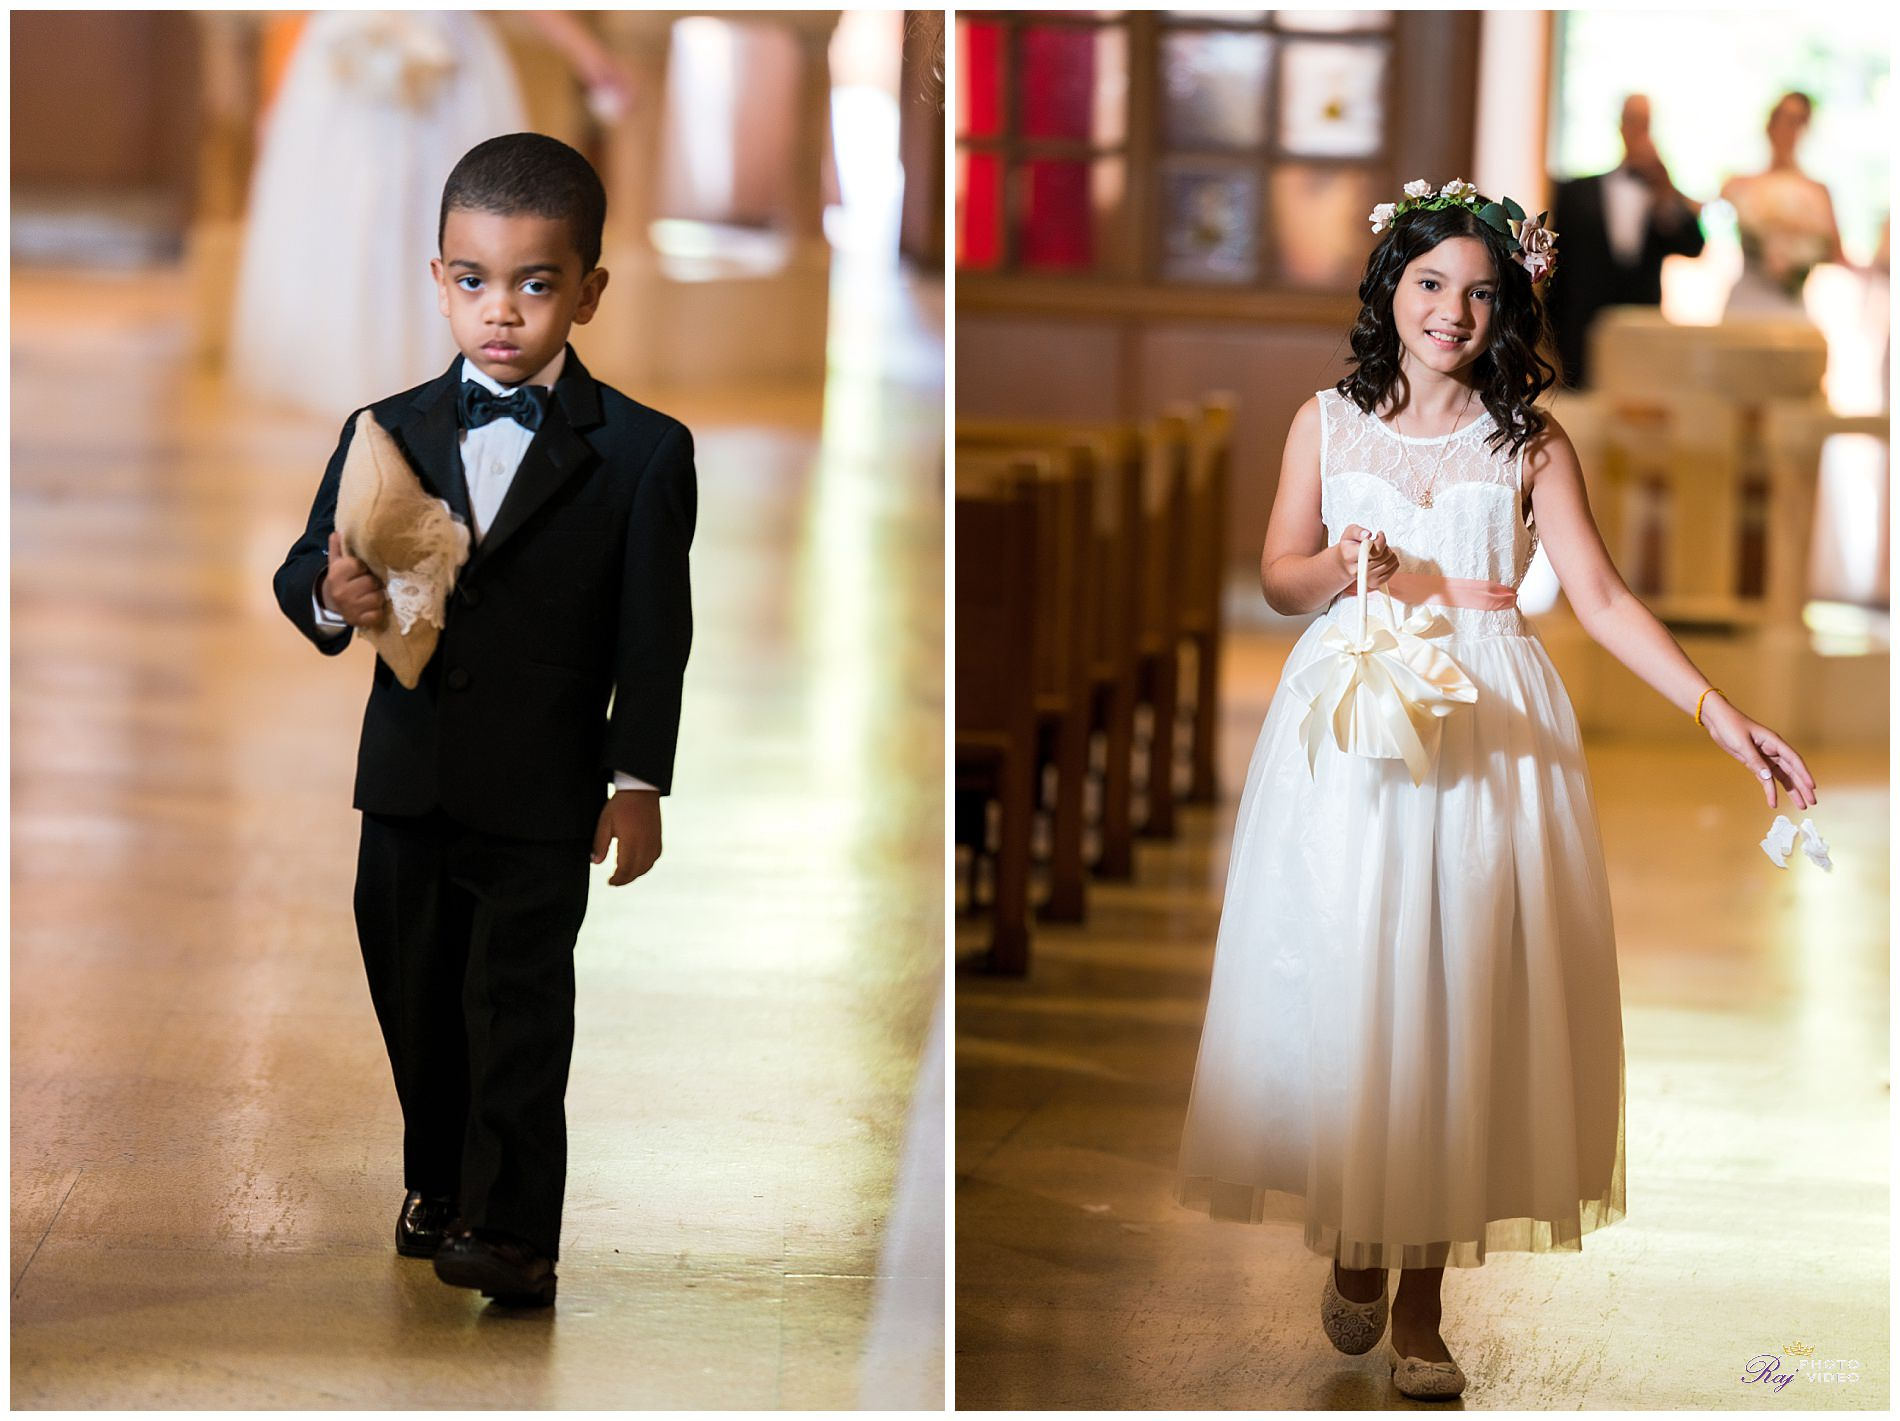 St-Valentines-Catholic-Church-Bloomfield-NJ-Wedding-Yanet-Jose-5.jpg